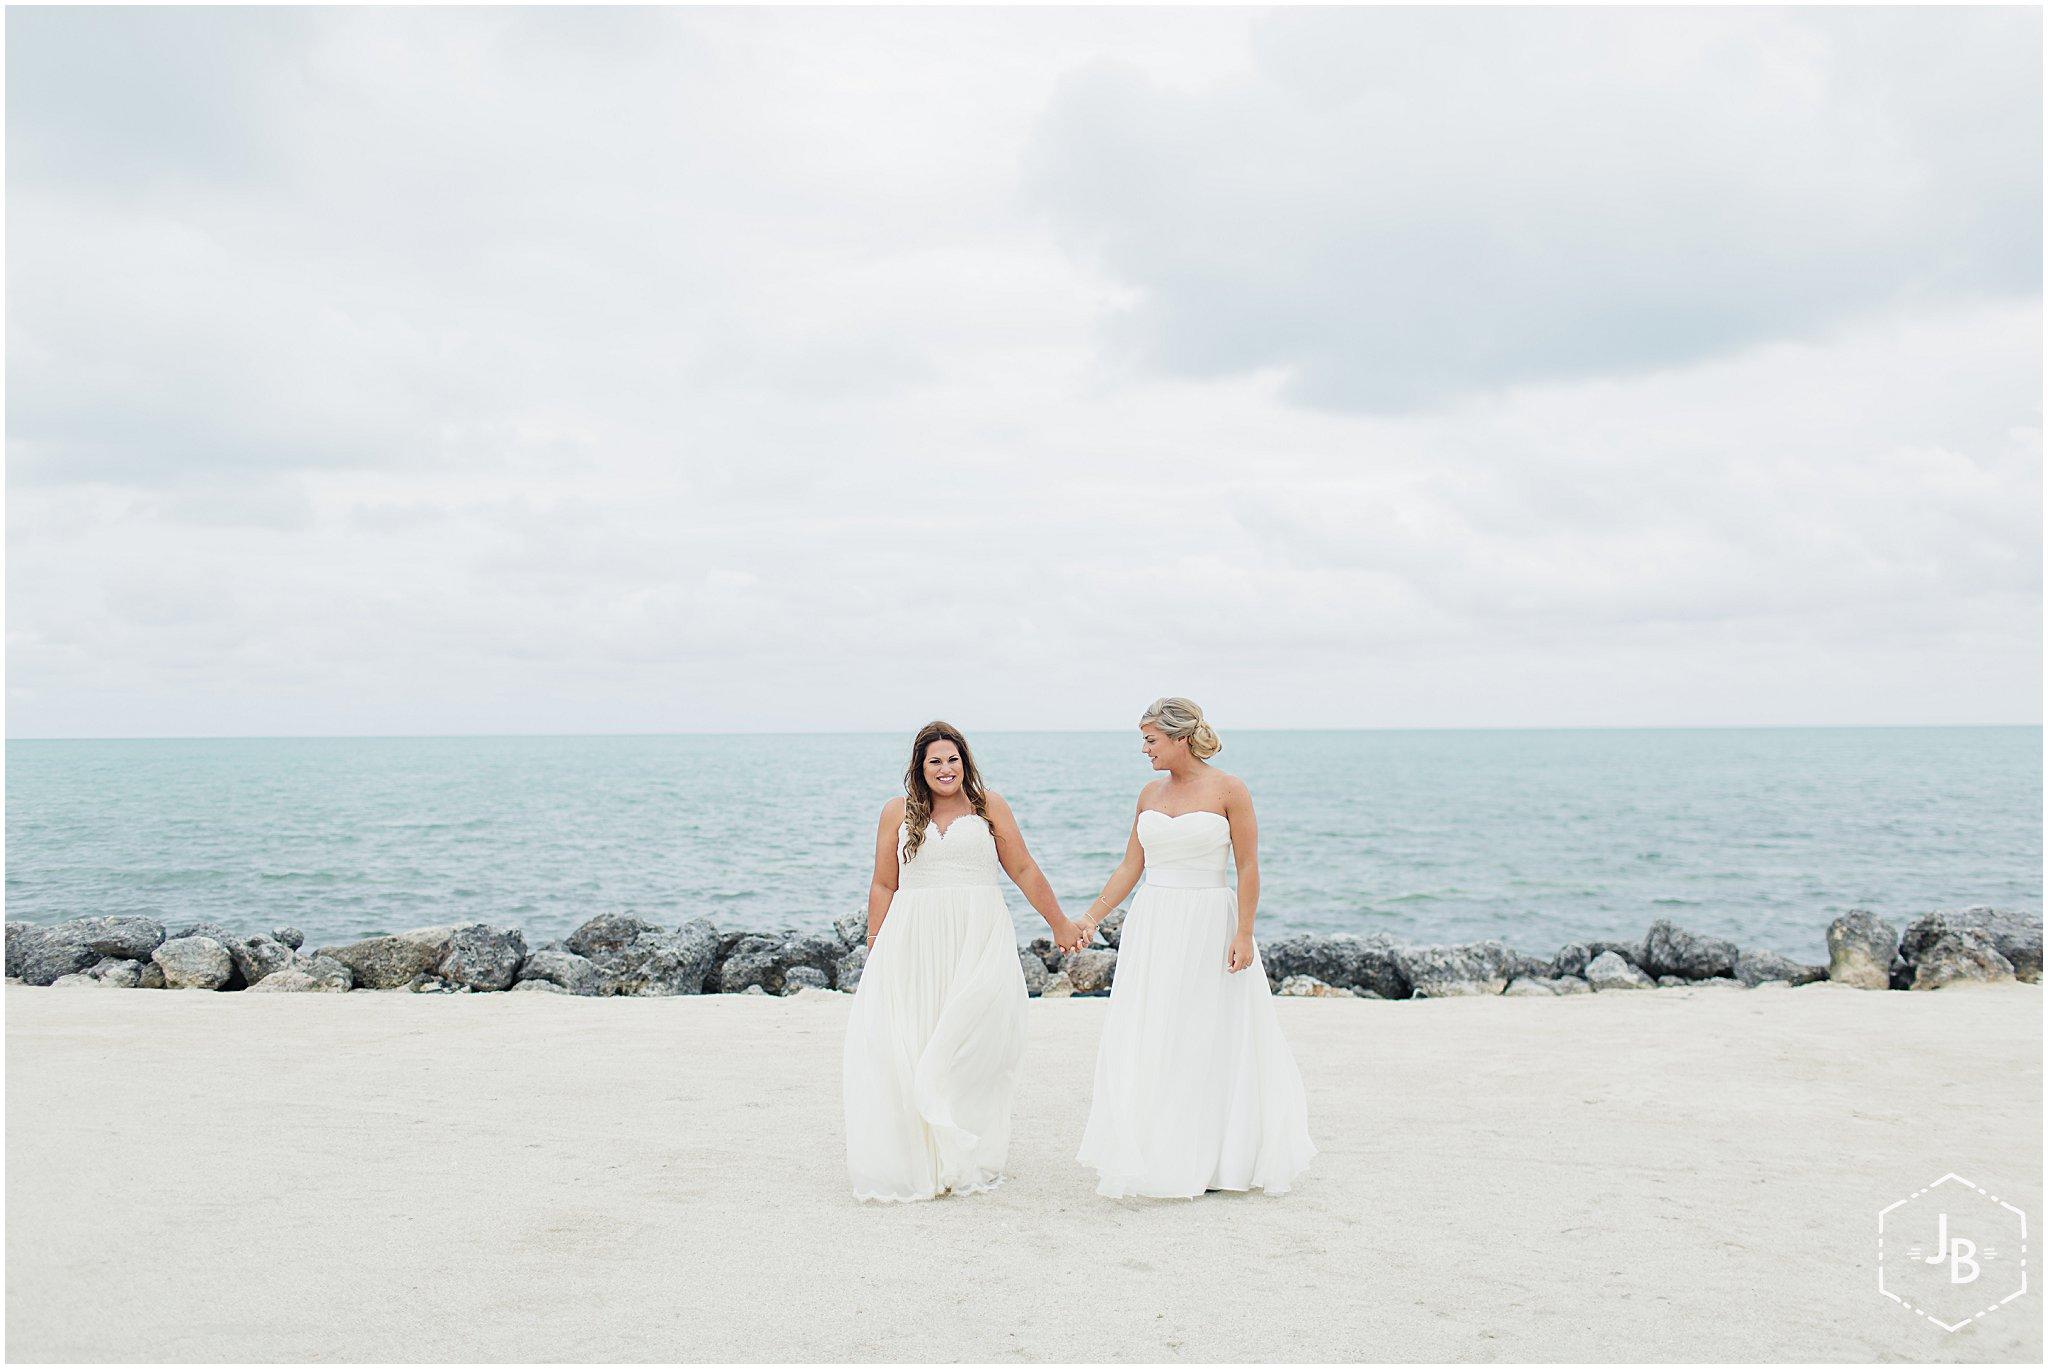 WeddingandEngagementFloridaPhotographer_1440.jpg